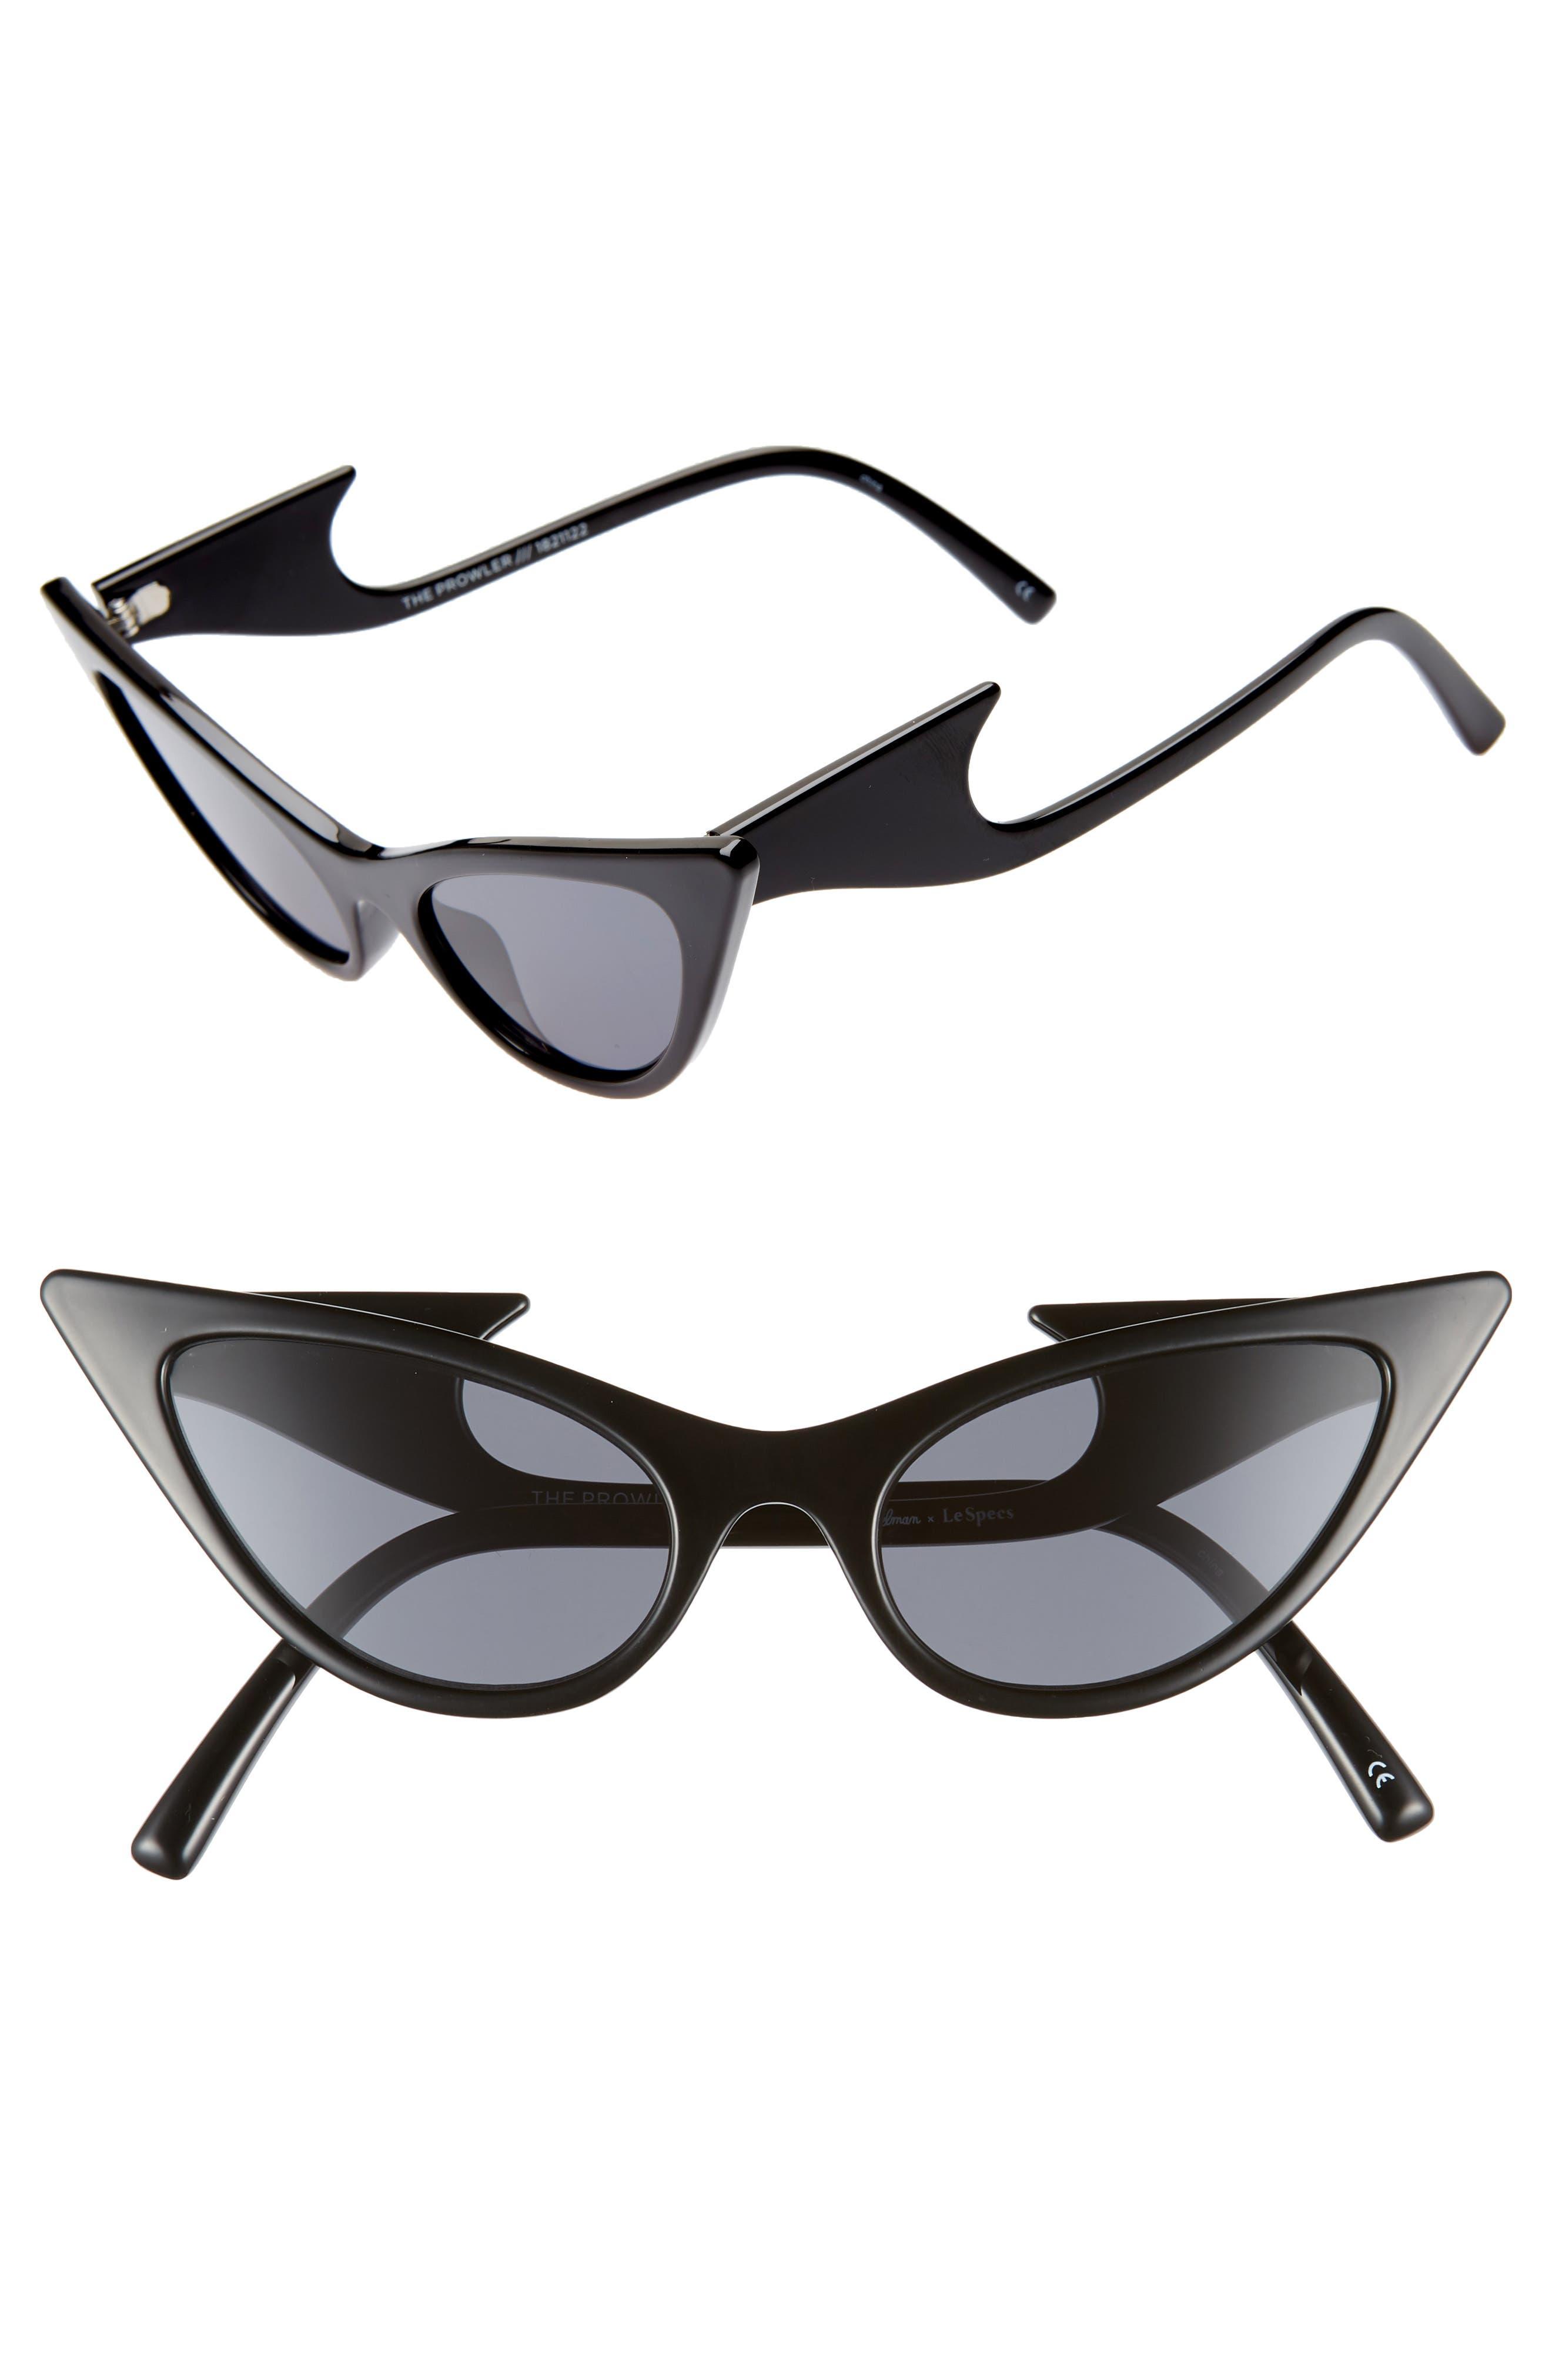 Adam Selman X Le Specs Luxe The Prowler 55Mm Sunglasses - Black